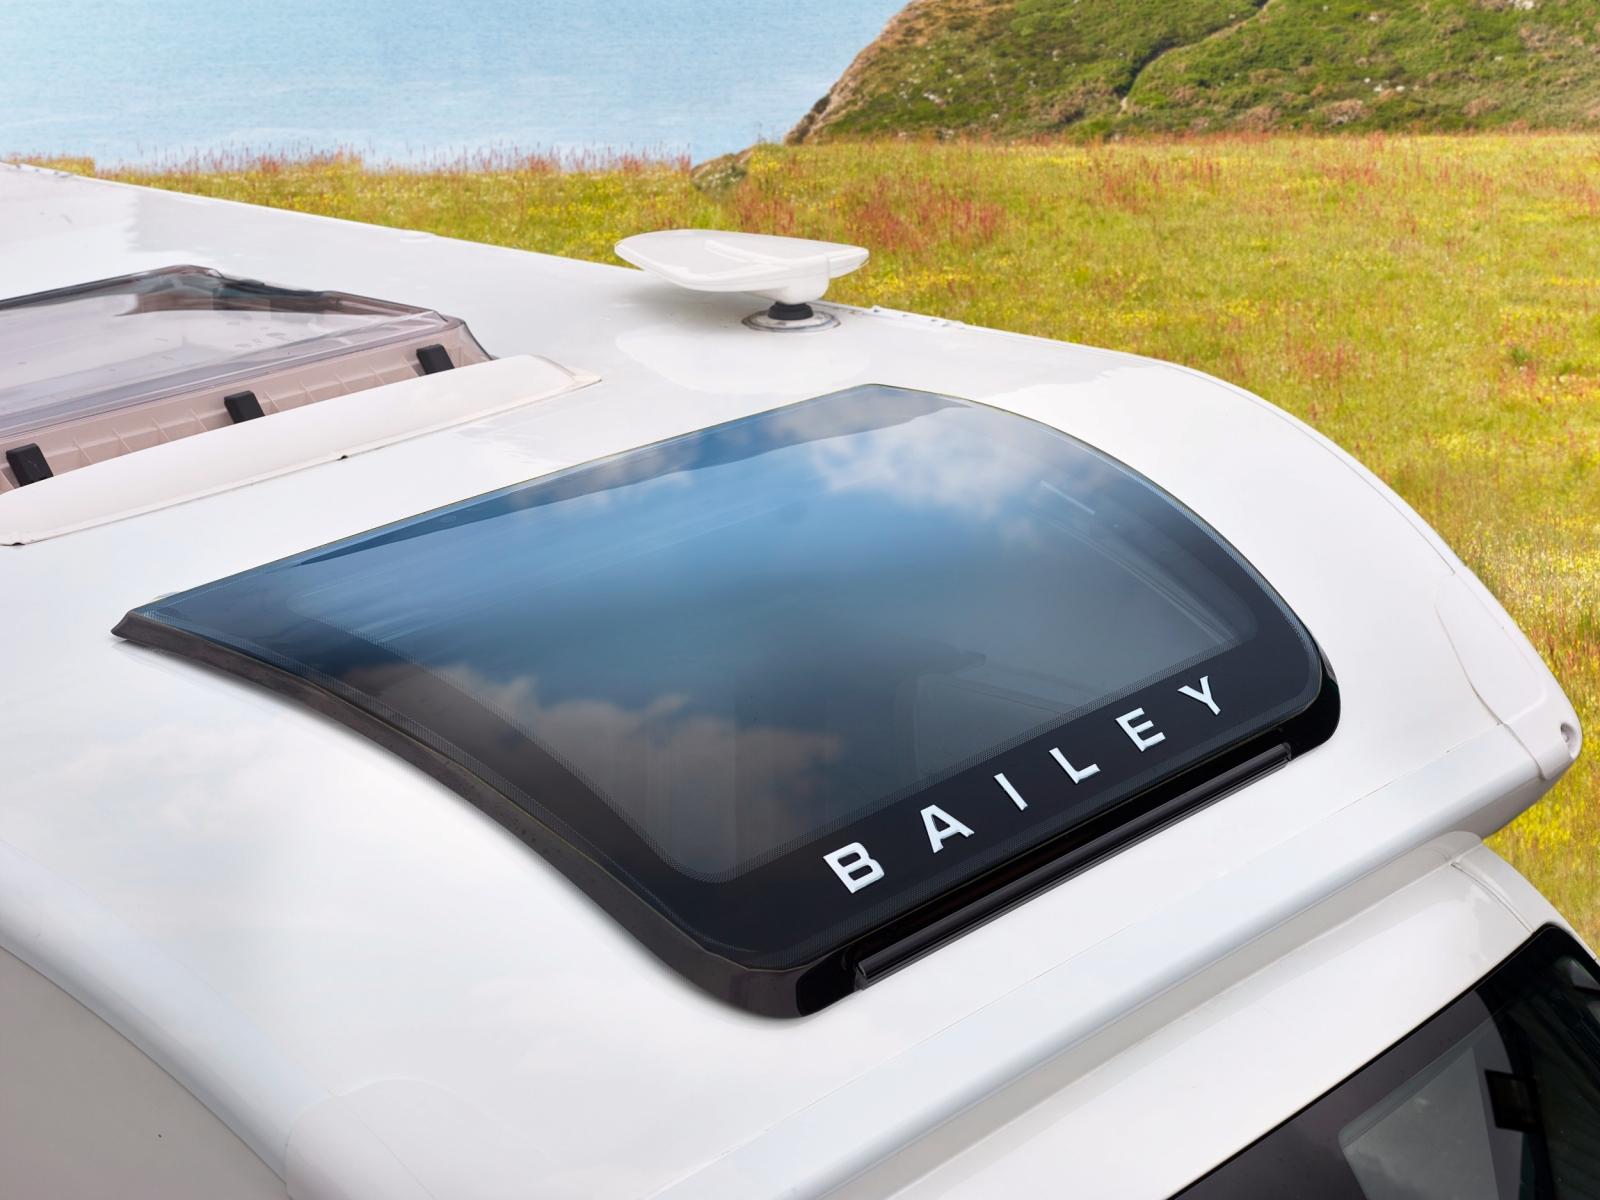 Bailey Autograph 79-6 image